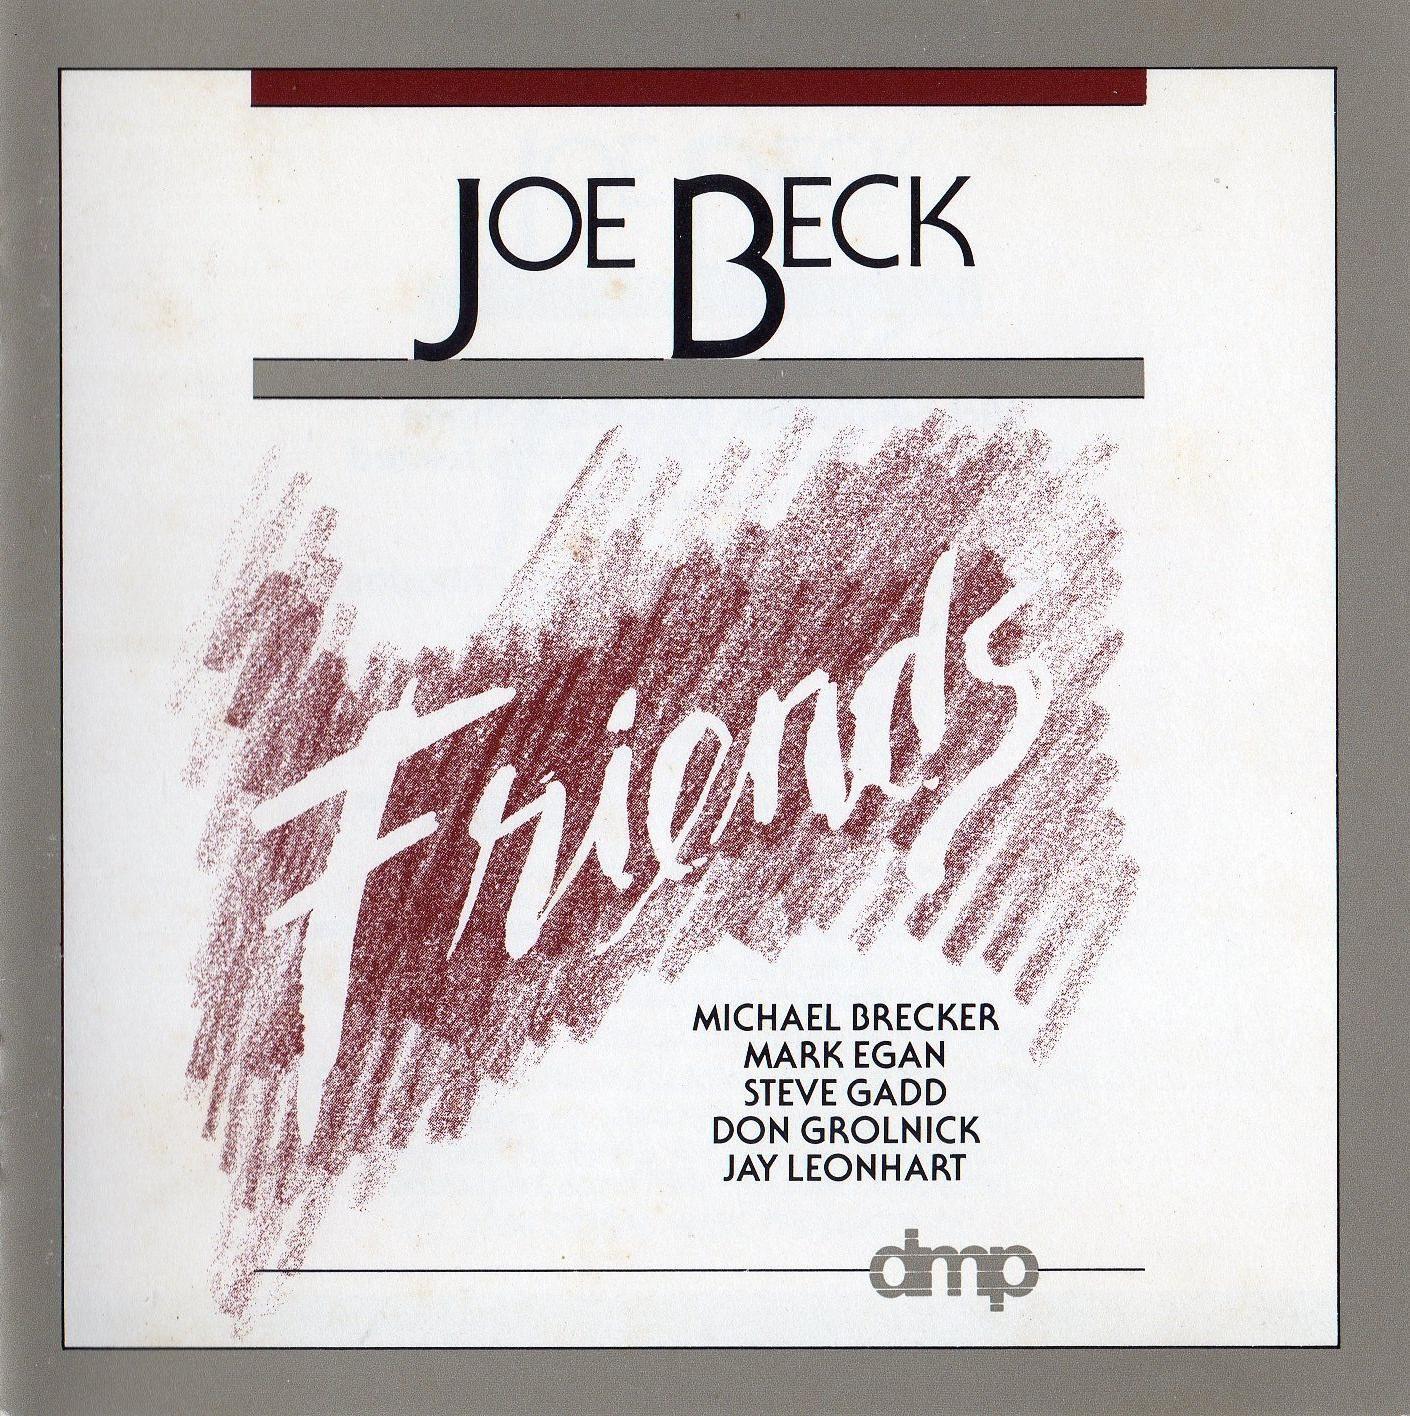 jazz rock fusion guitar joe beck 1984 friends. Black Bedroom Furniture Sets. Home Design Ideas